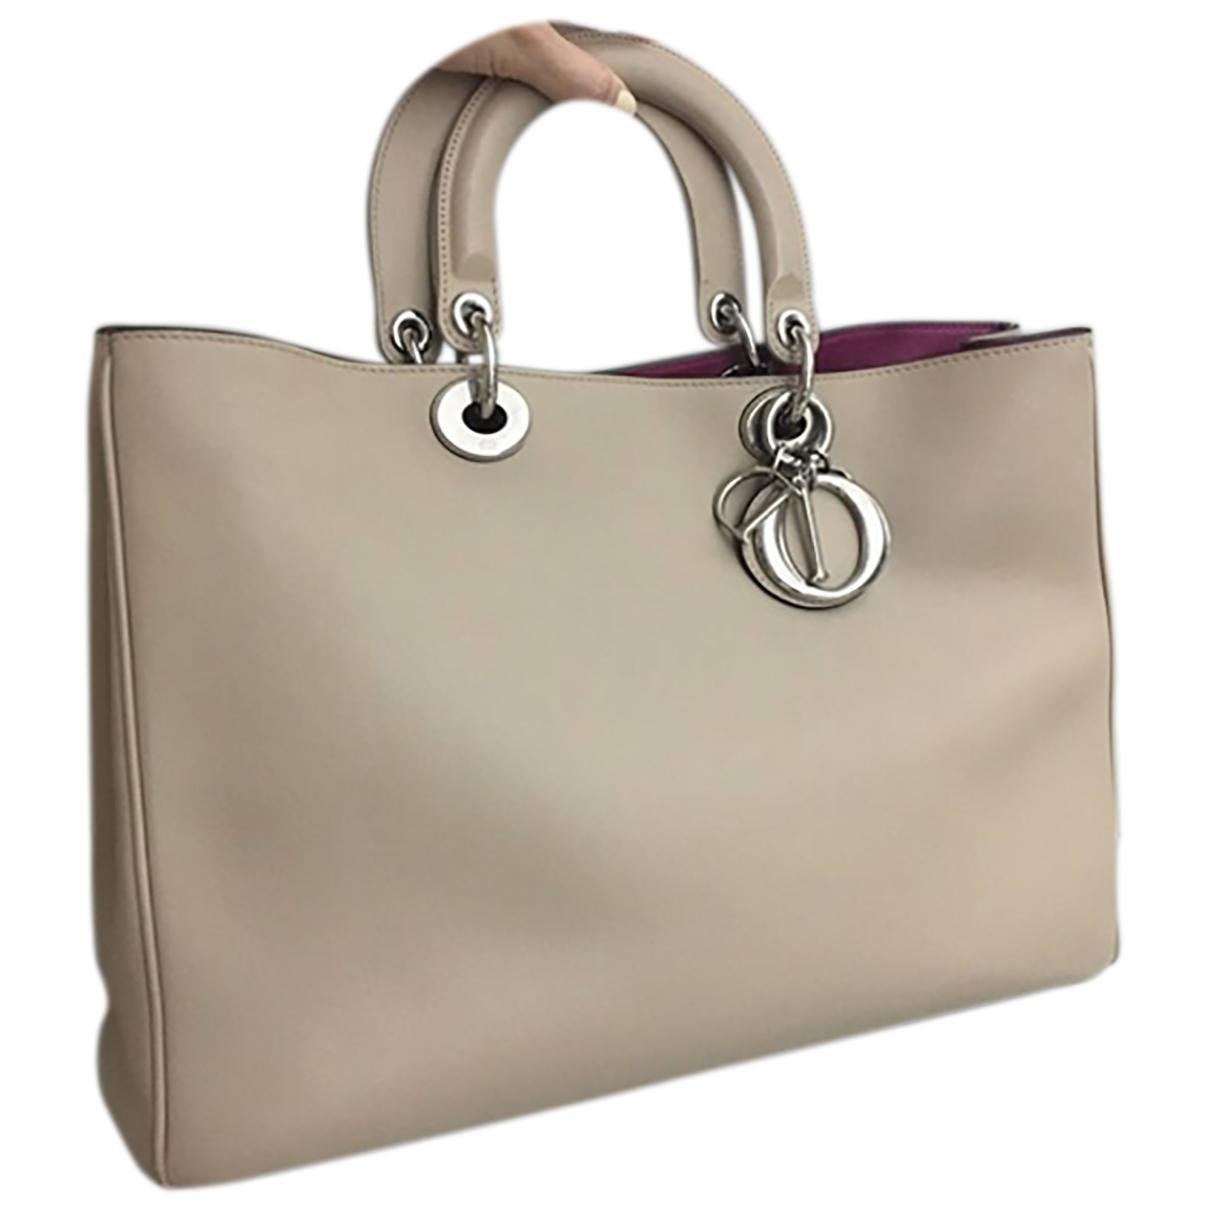 Dior Diorissimo Beige Leather handbag for Women \N